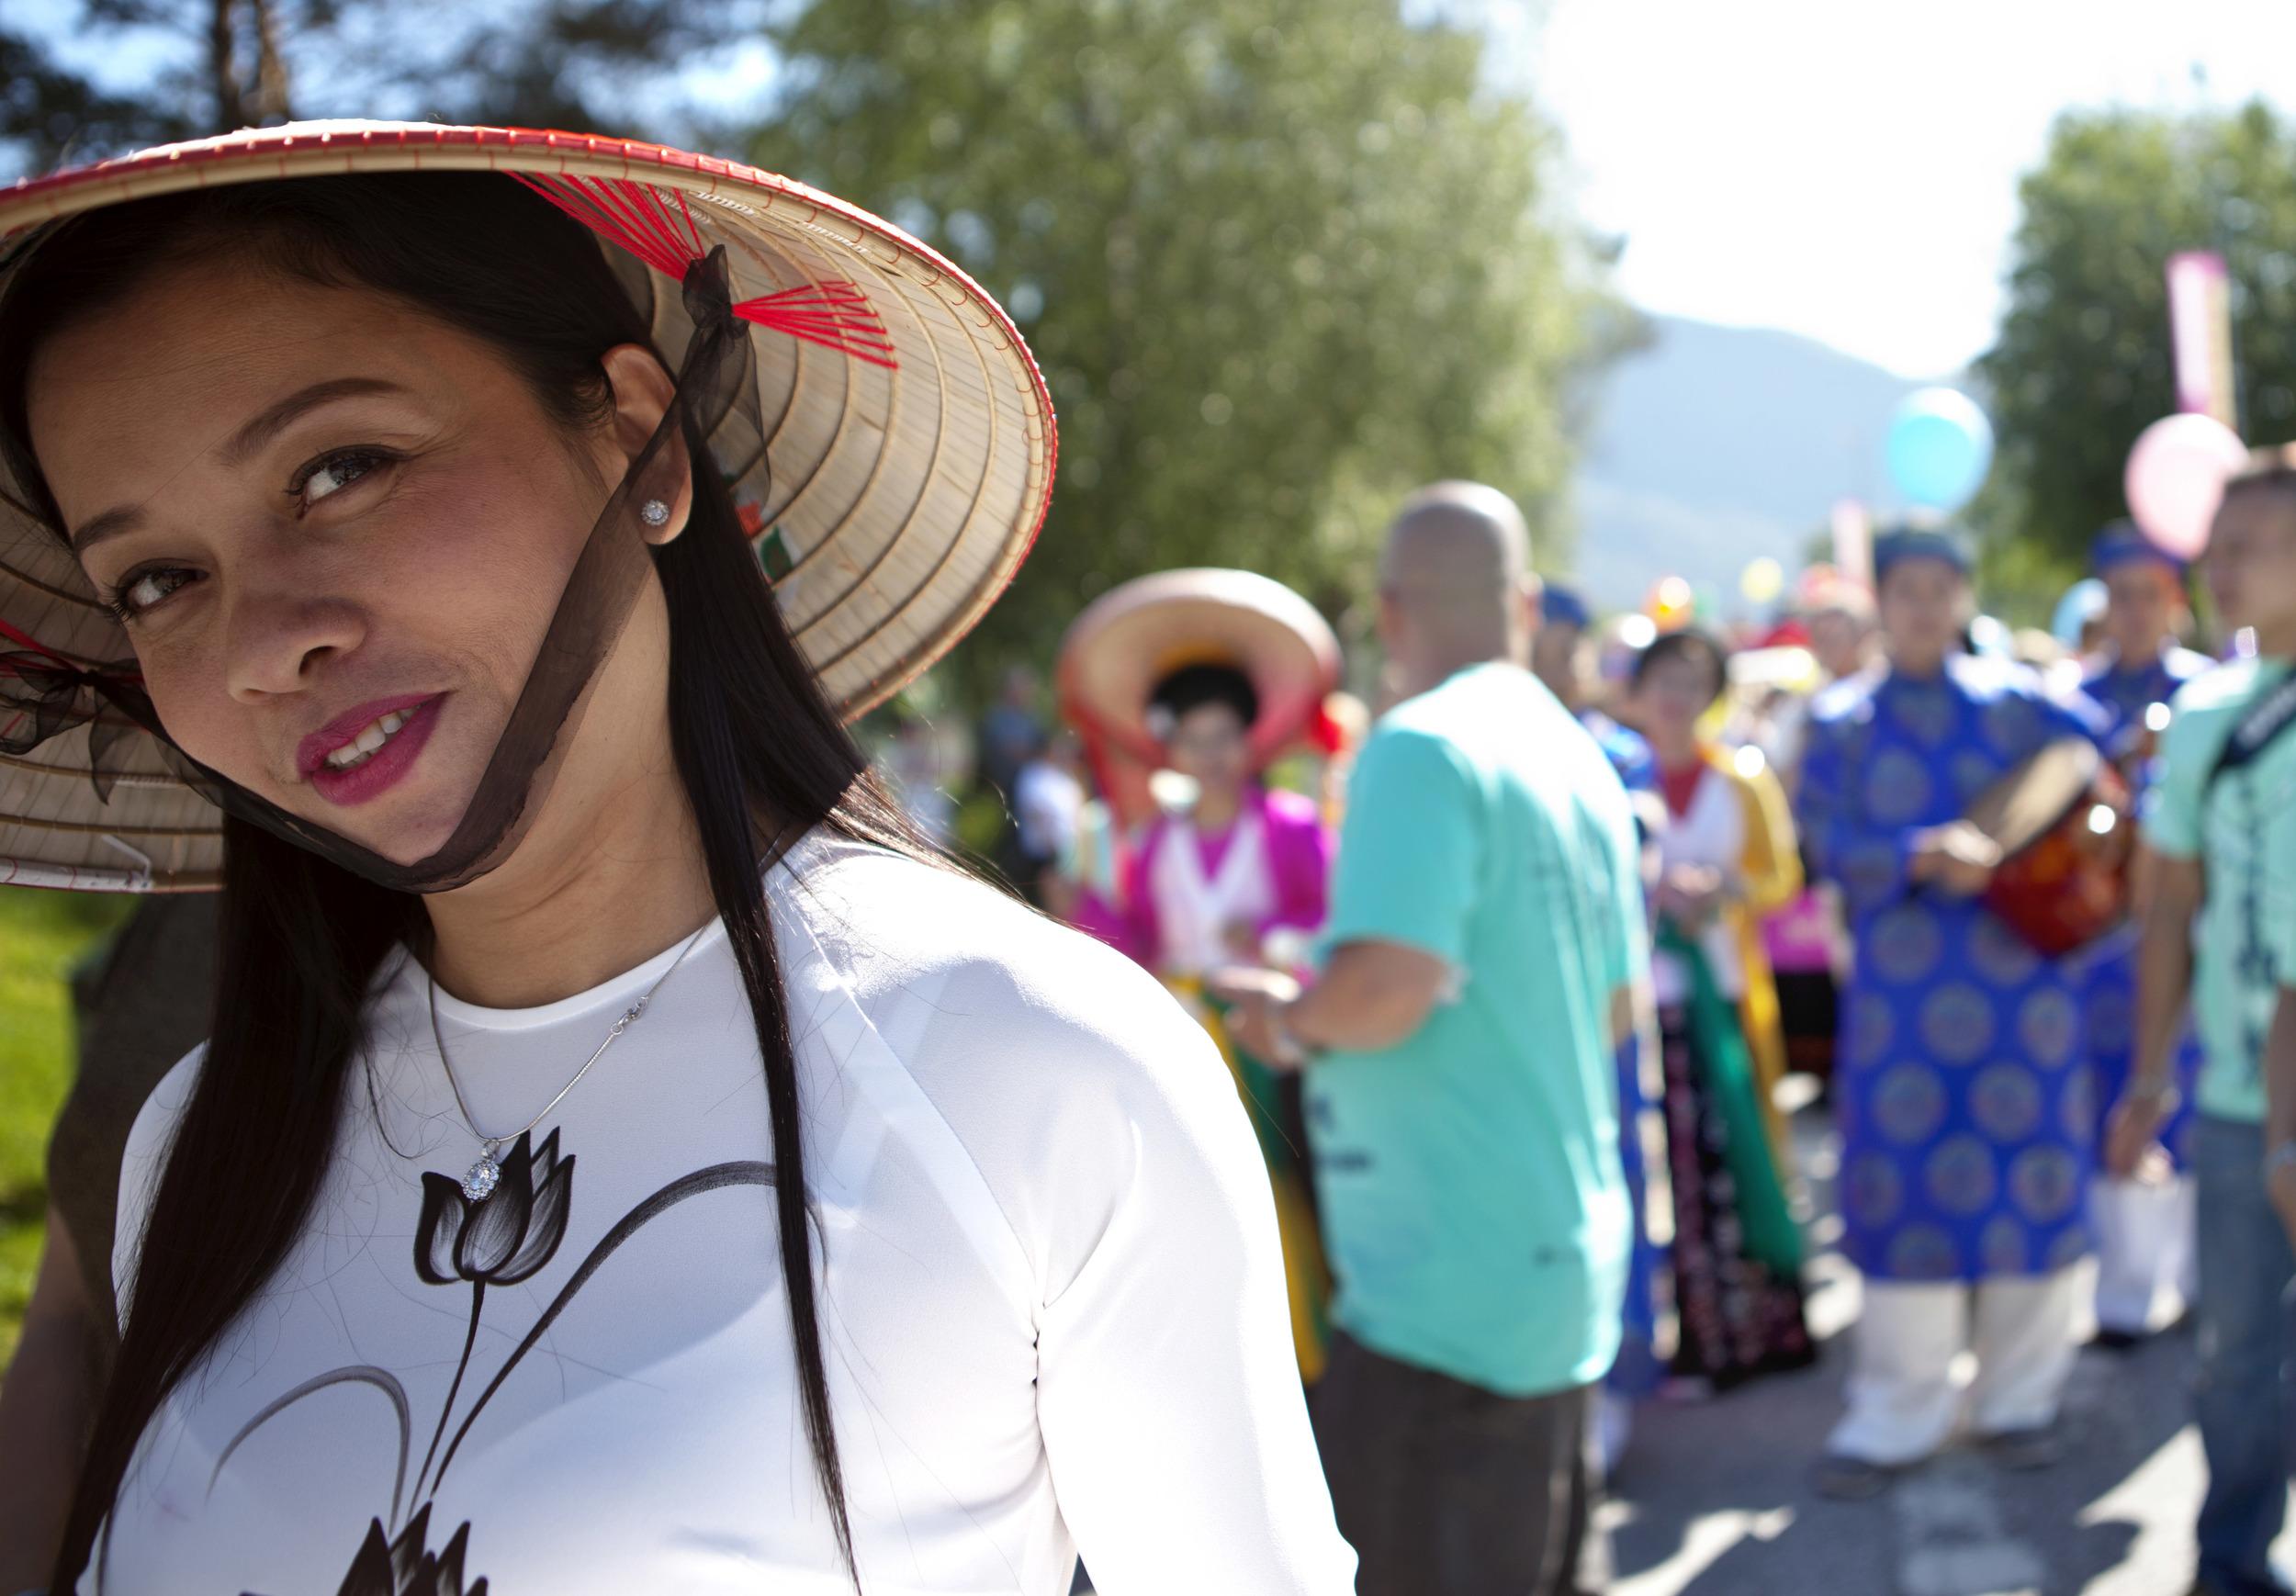 festivalparaden - heidi hattestein -IMG_4795.jpg